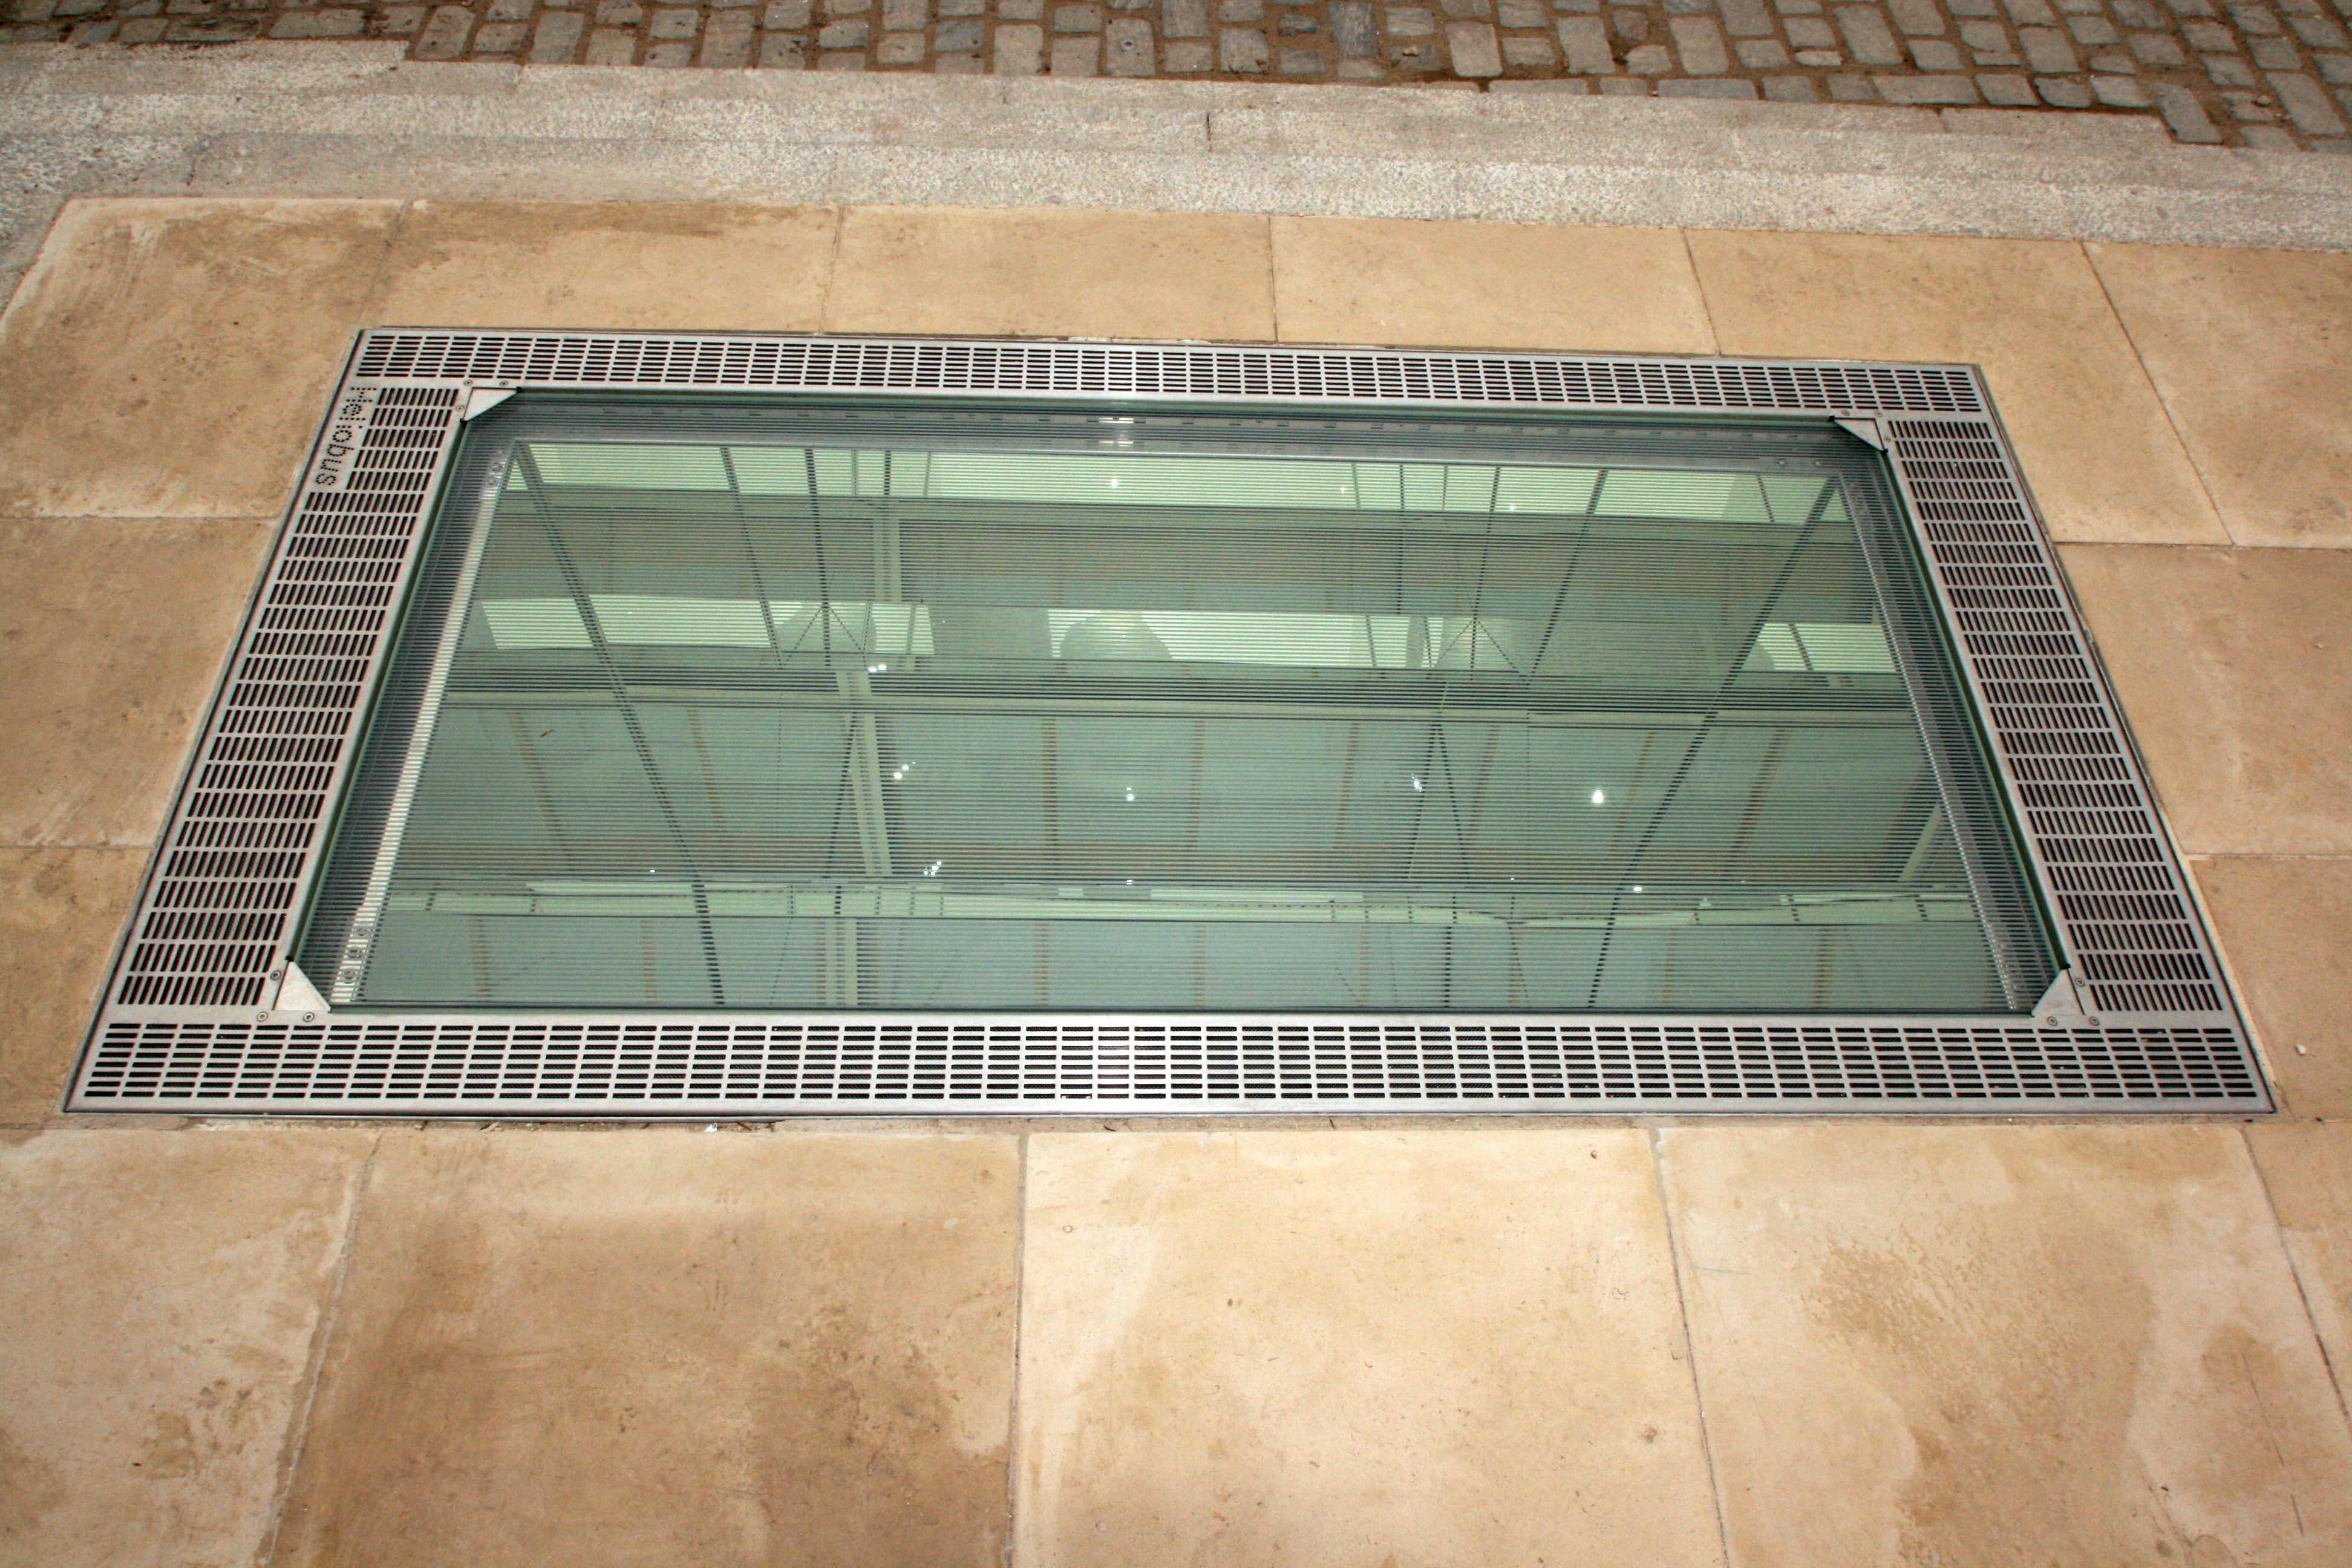 Heliobus Mirror Shaft cover bringing daylight ventilation and